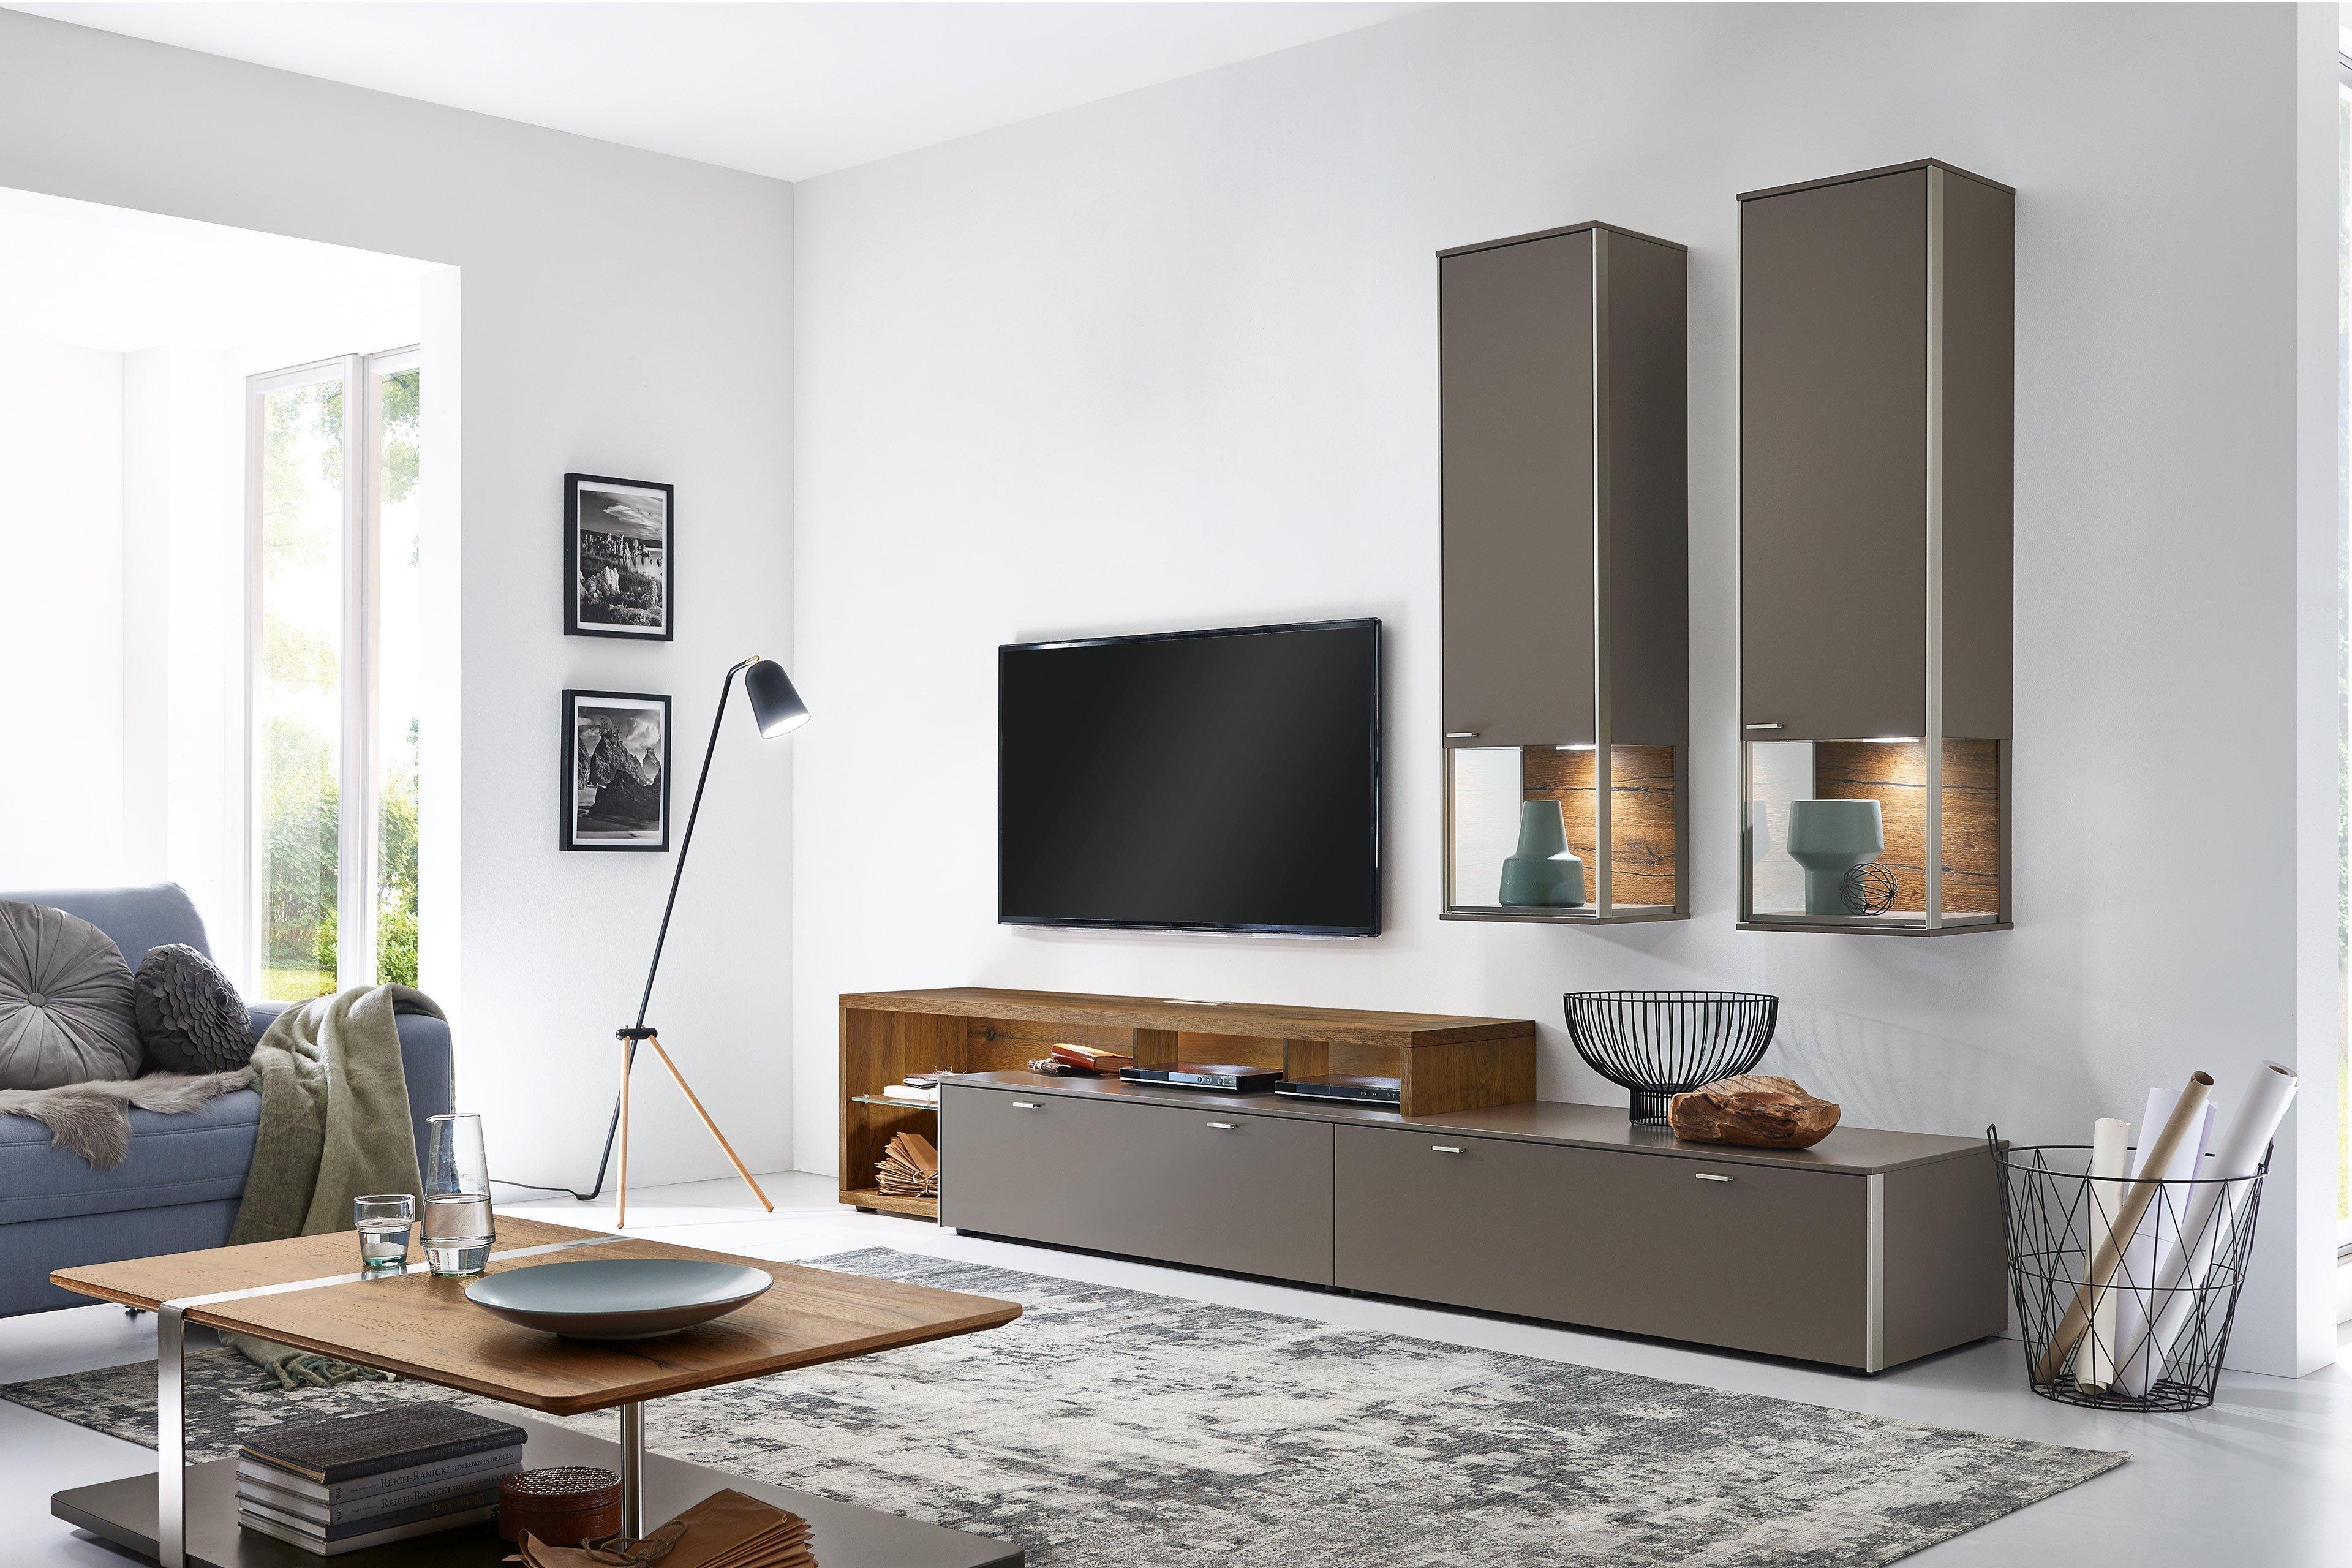 venjakob wohnwand my blog. Black Bedroom Furniture Sets. Home Design Ideas